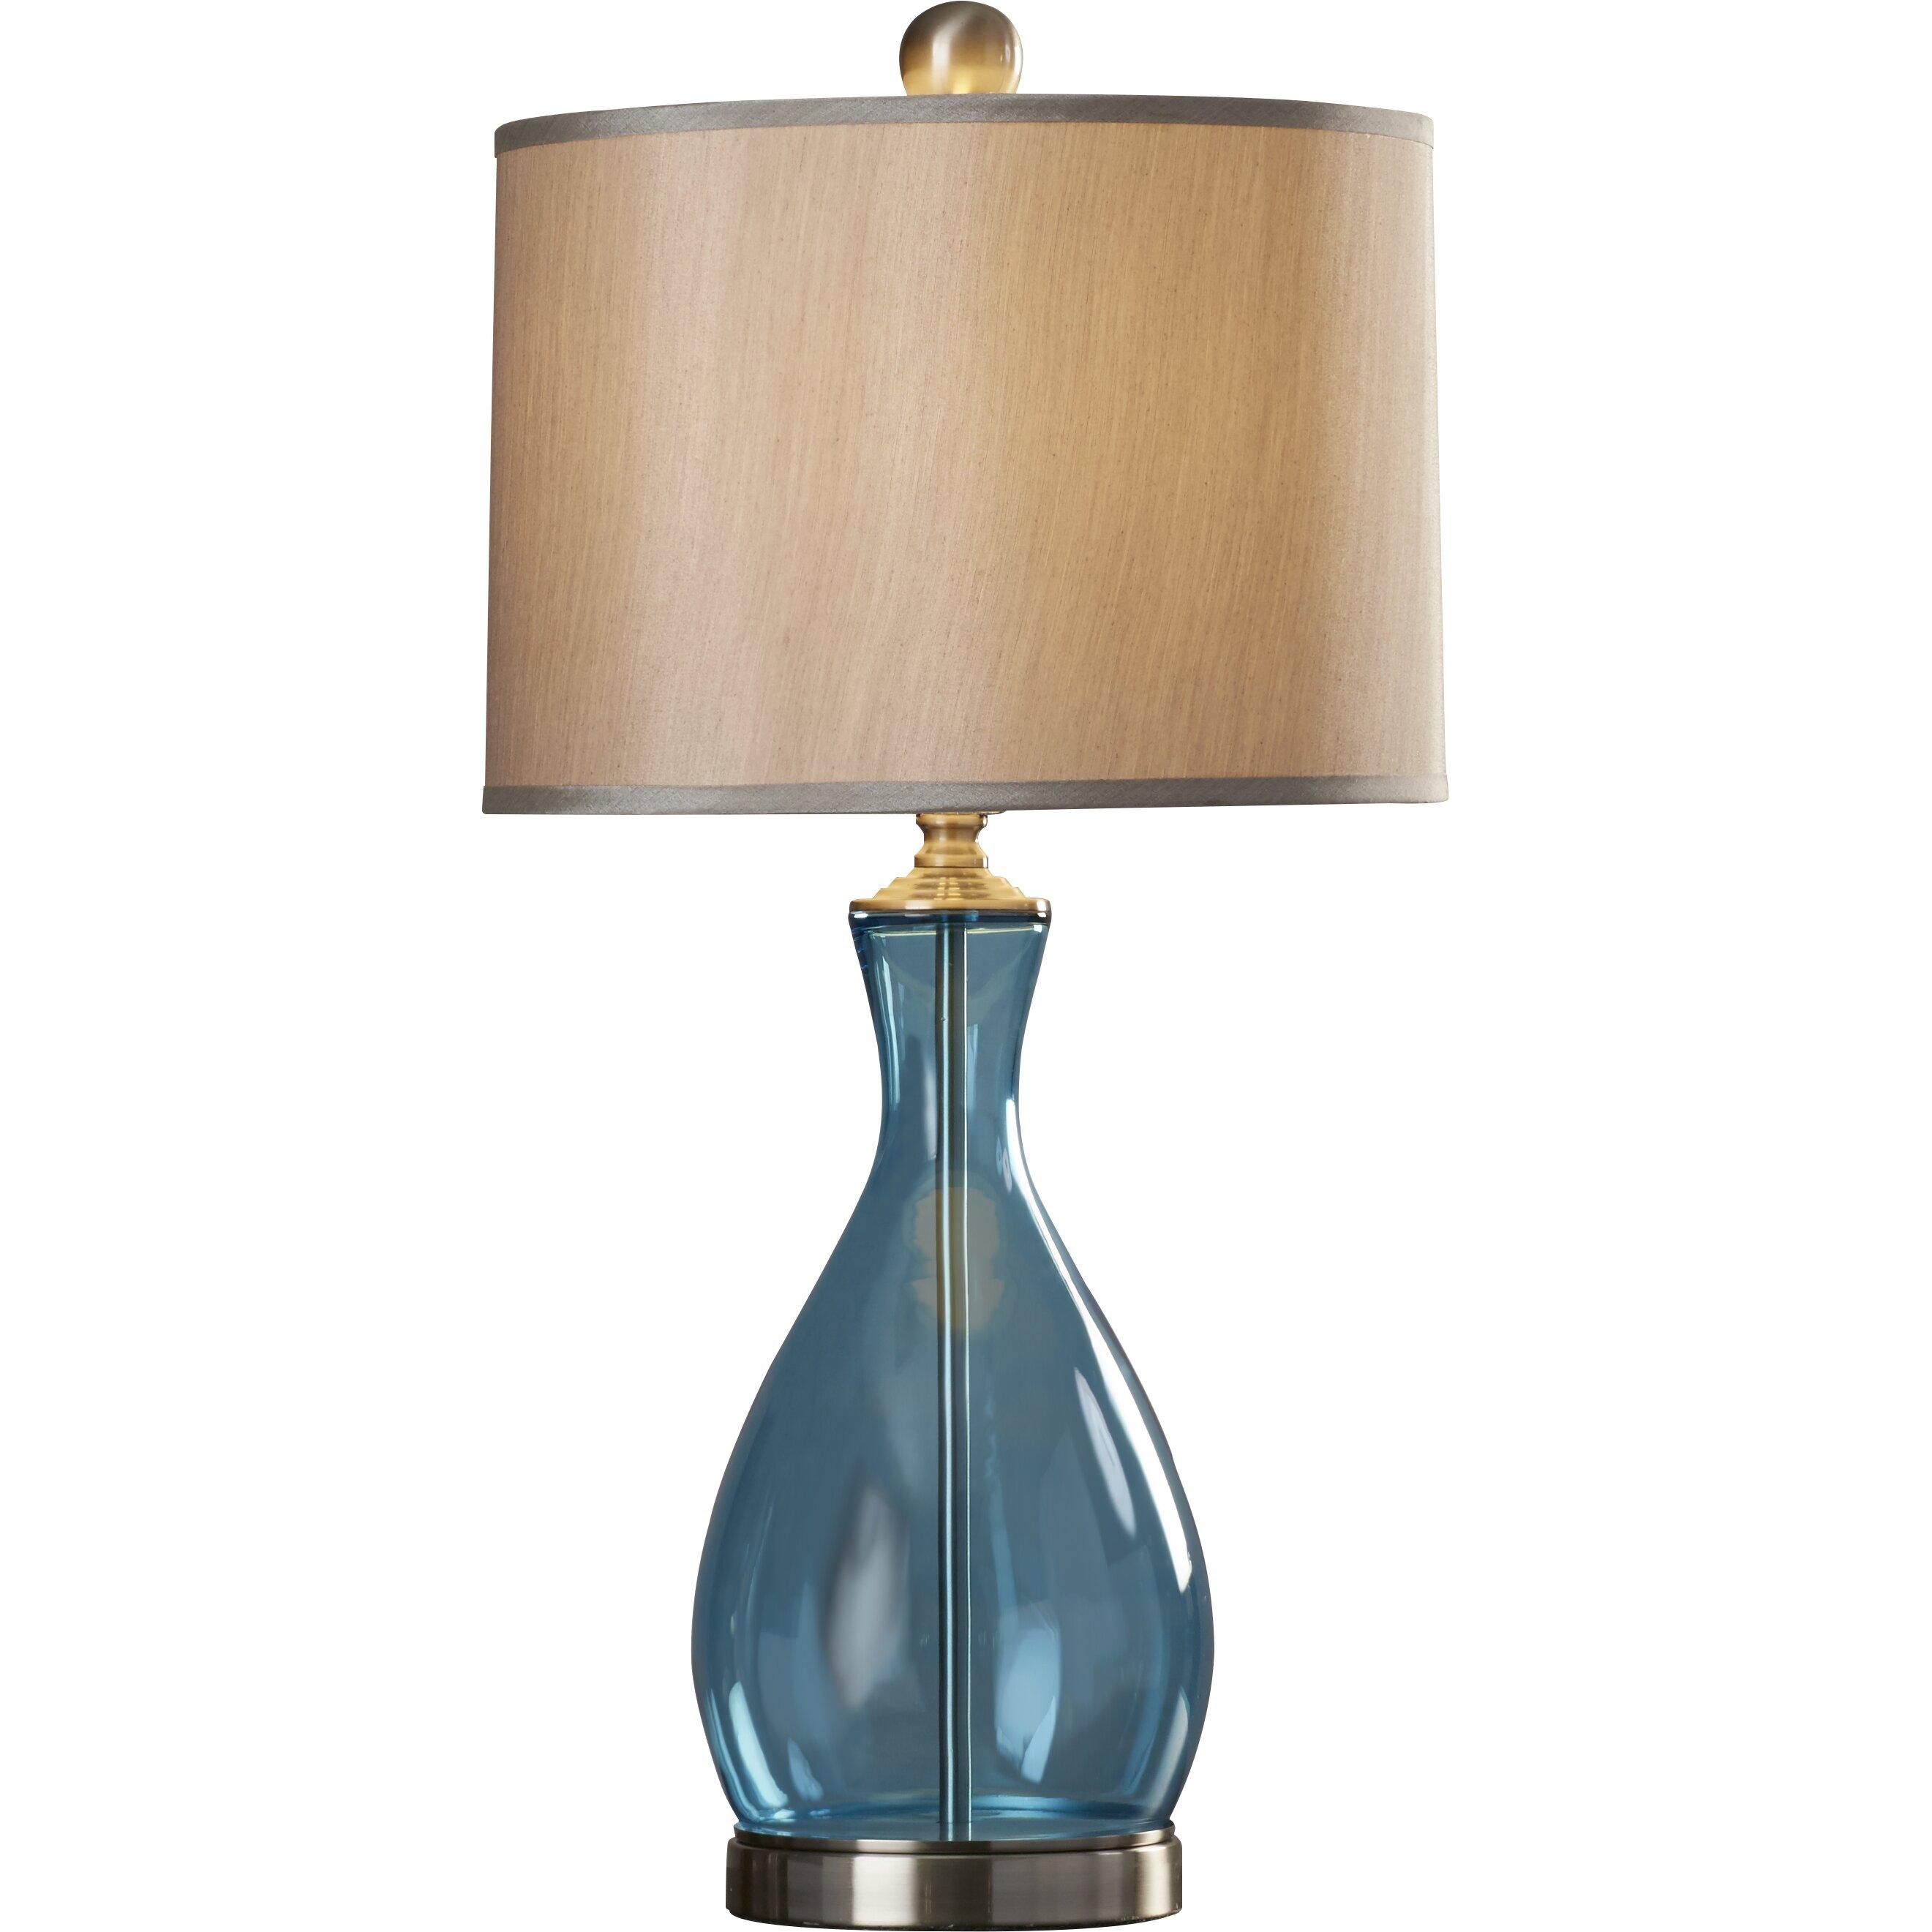 beachcrest home fairhaven 29 table lamp reviews wayfair. Black Bedroom Furniture Sets. Home Design Ideas